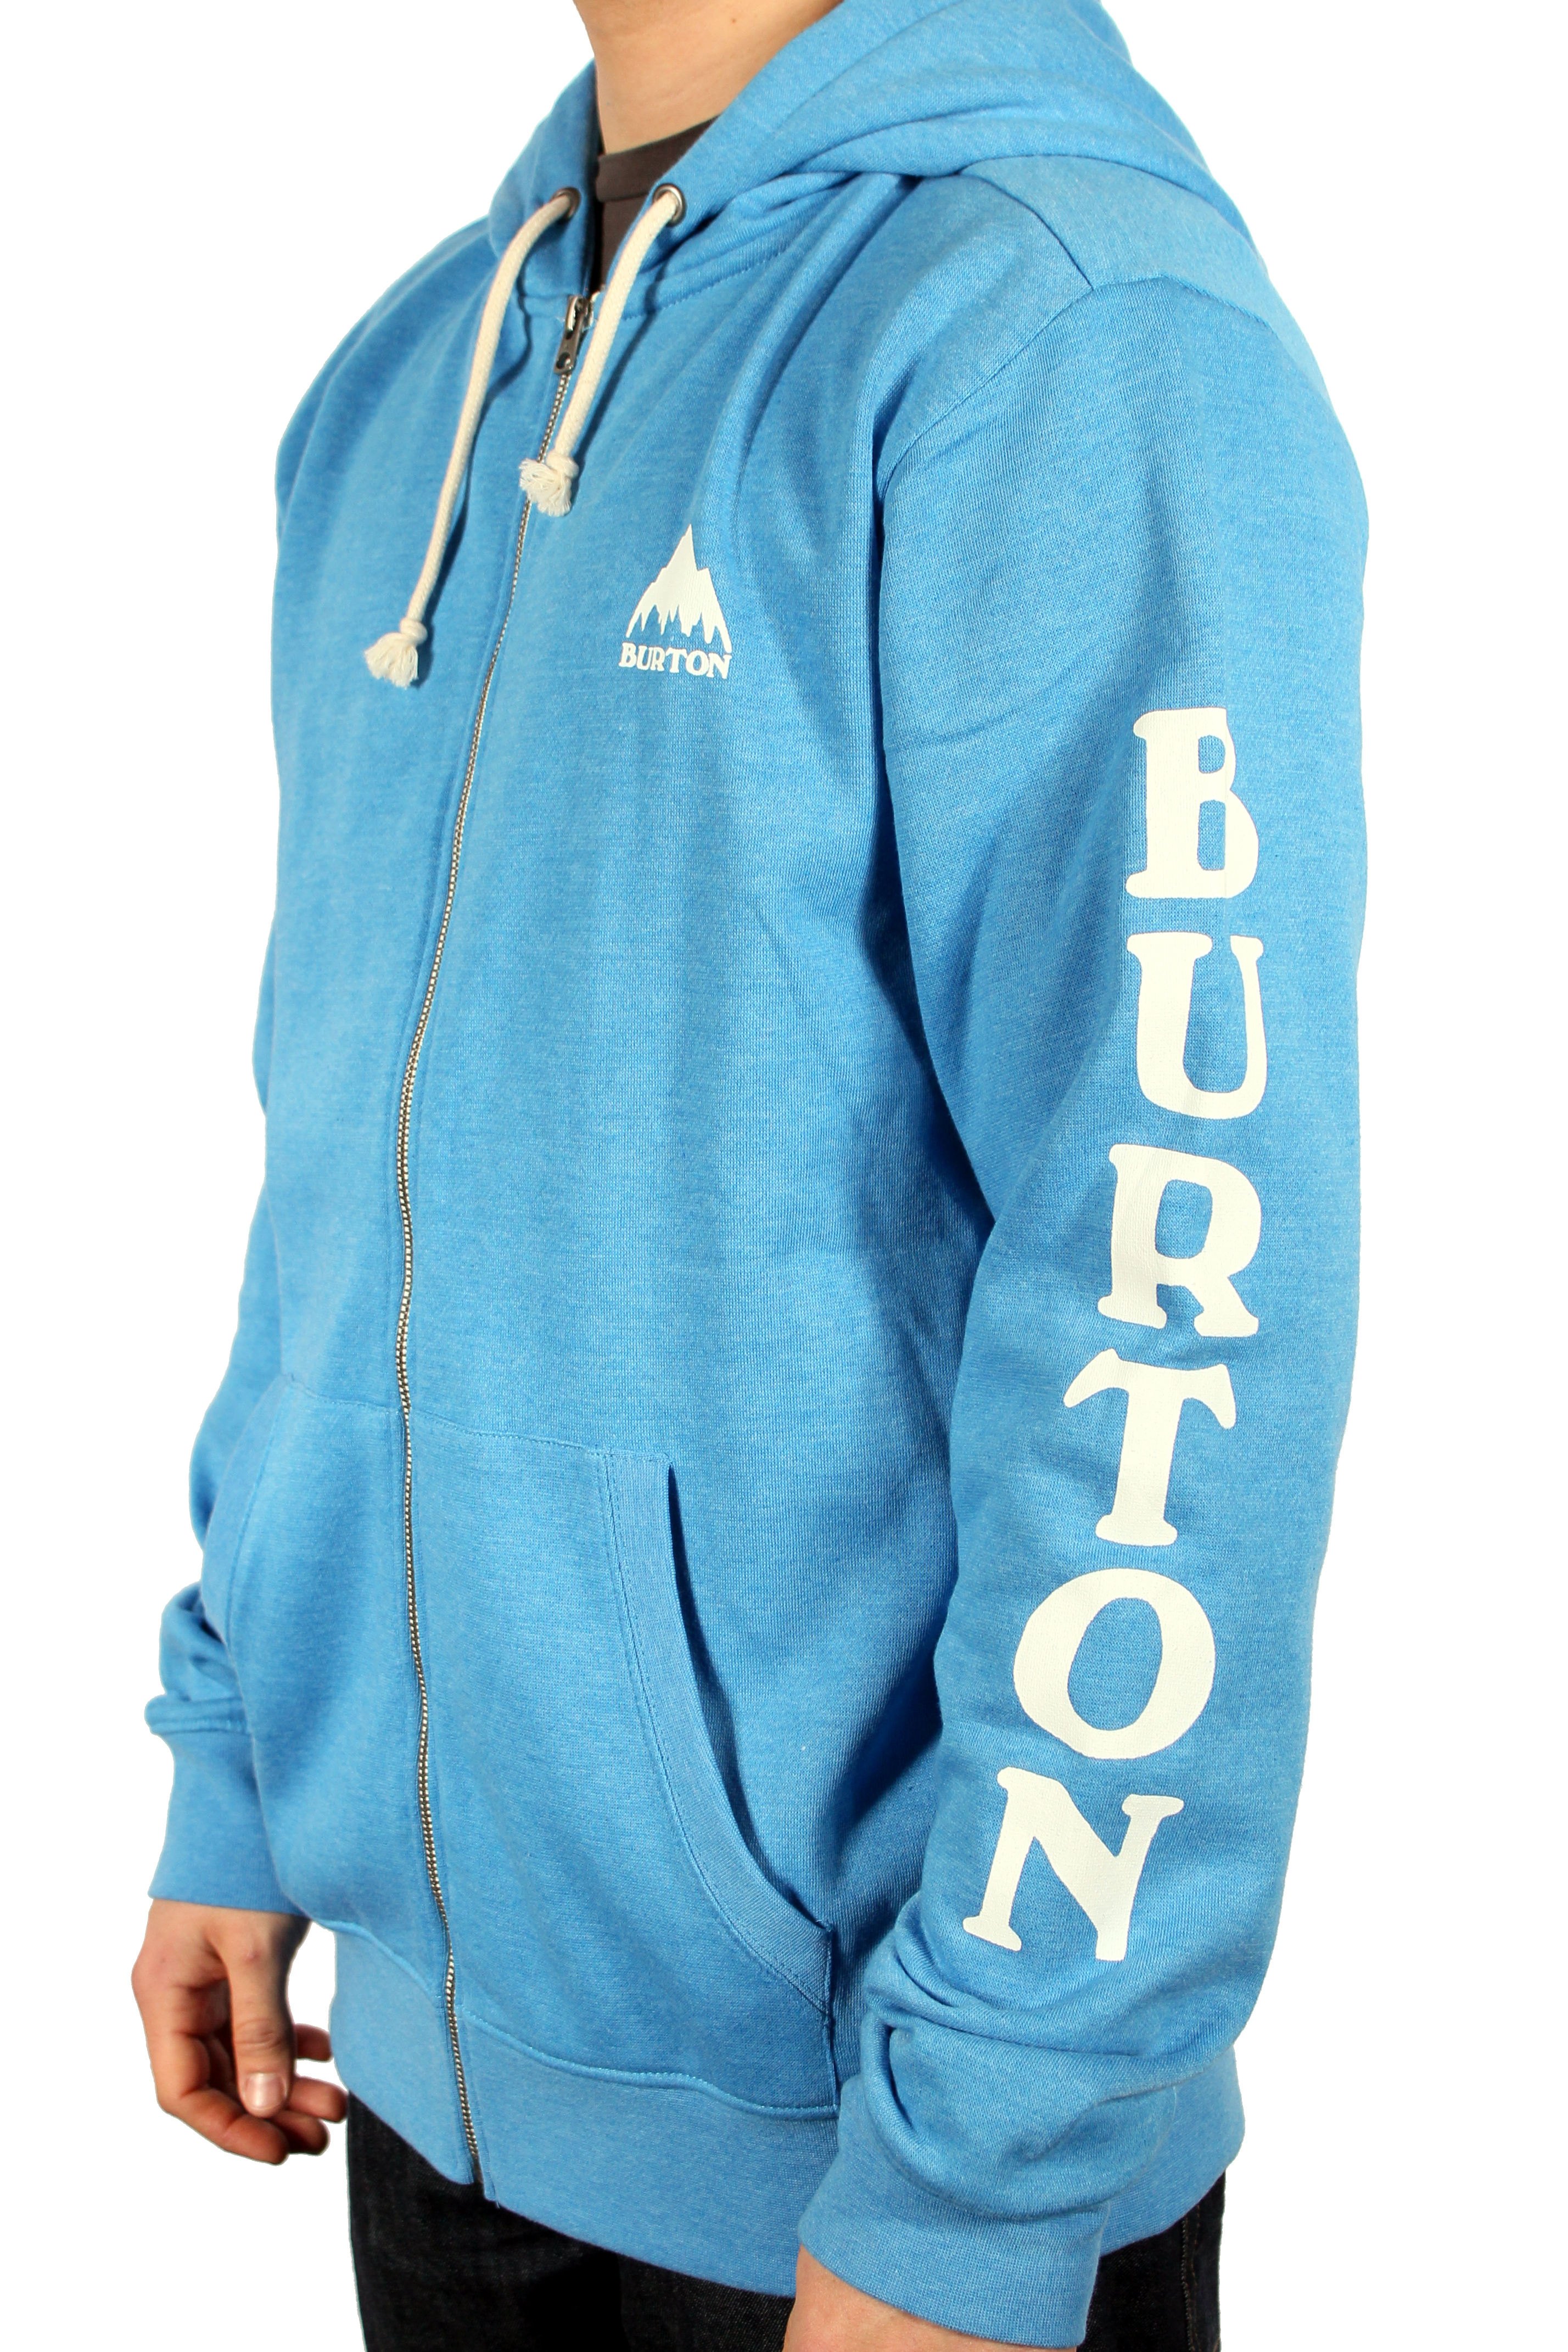 Bluza Burton Cst Spark (Cove)